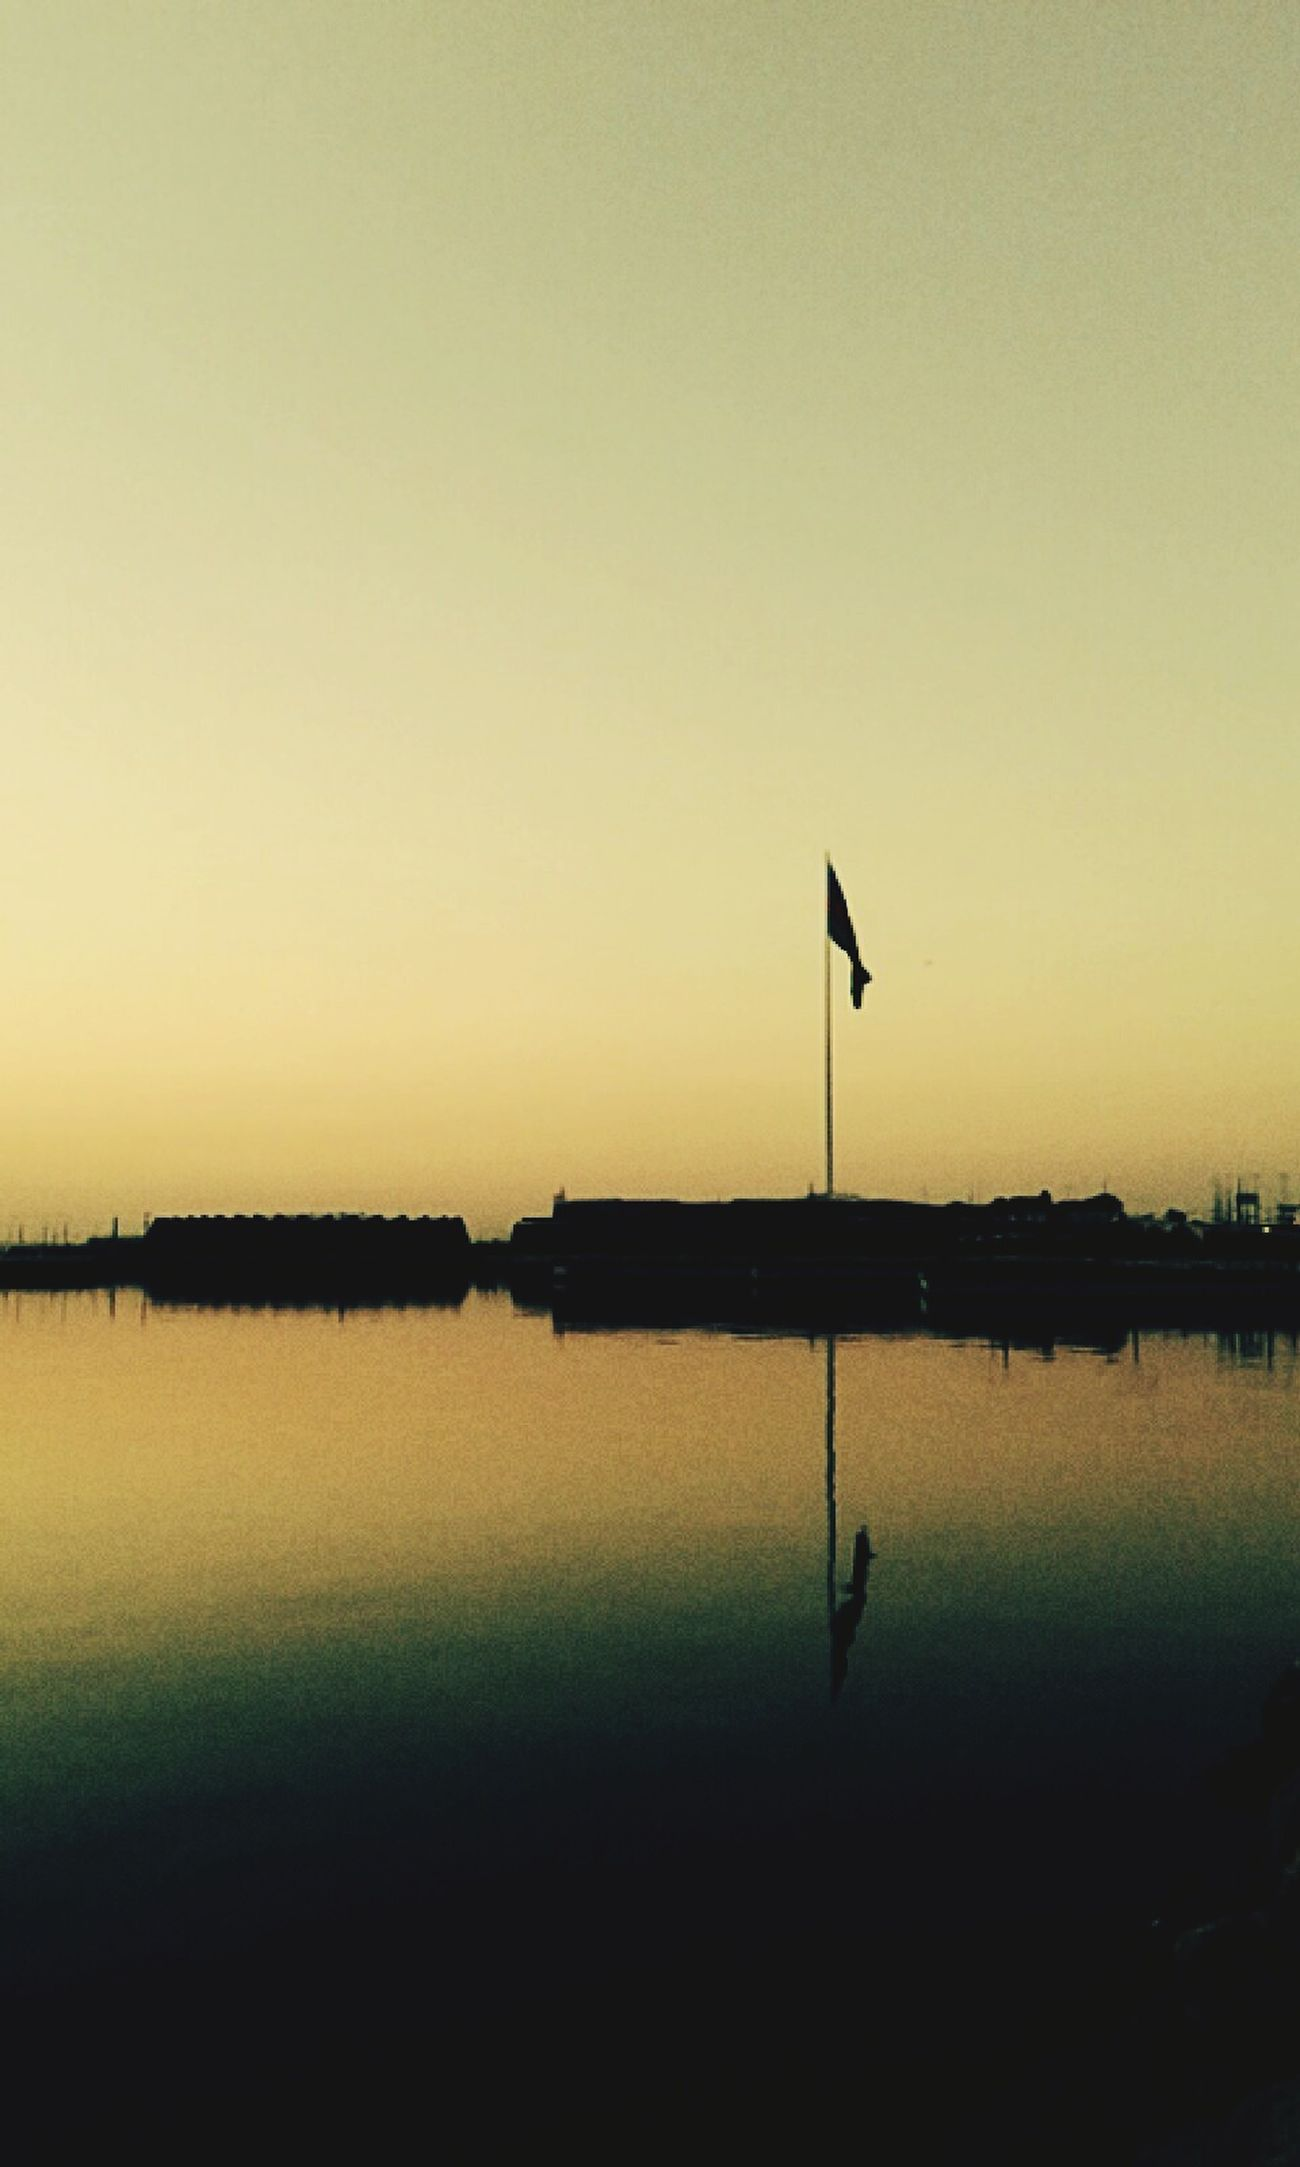 Flag Bayrak Azerbaijan Flag Baku Sunrise Sunrice #sunrice Morning Lovely [a:206937] Sea And Sky Caspian Sea Azərbaycan Türk Bayrağı